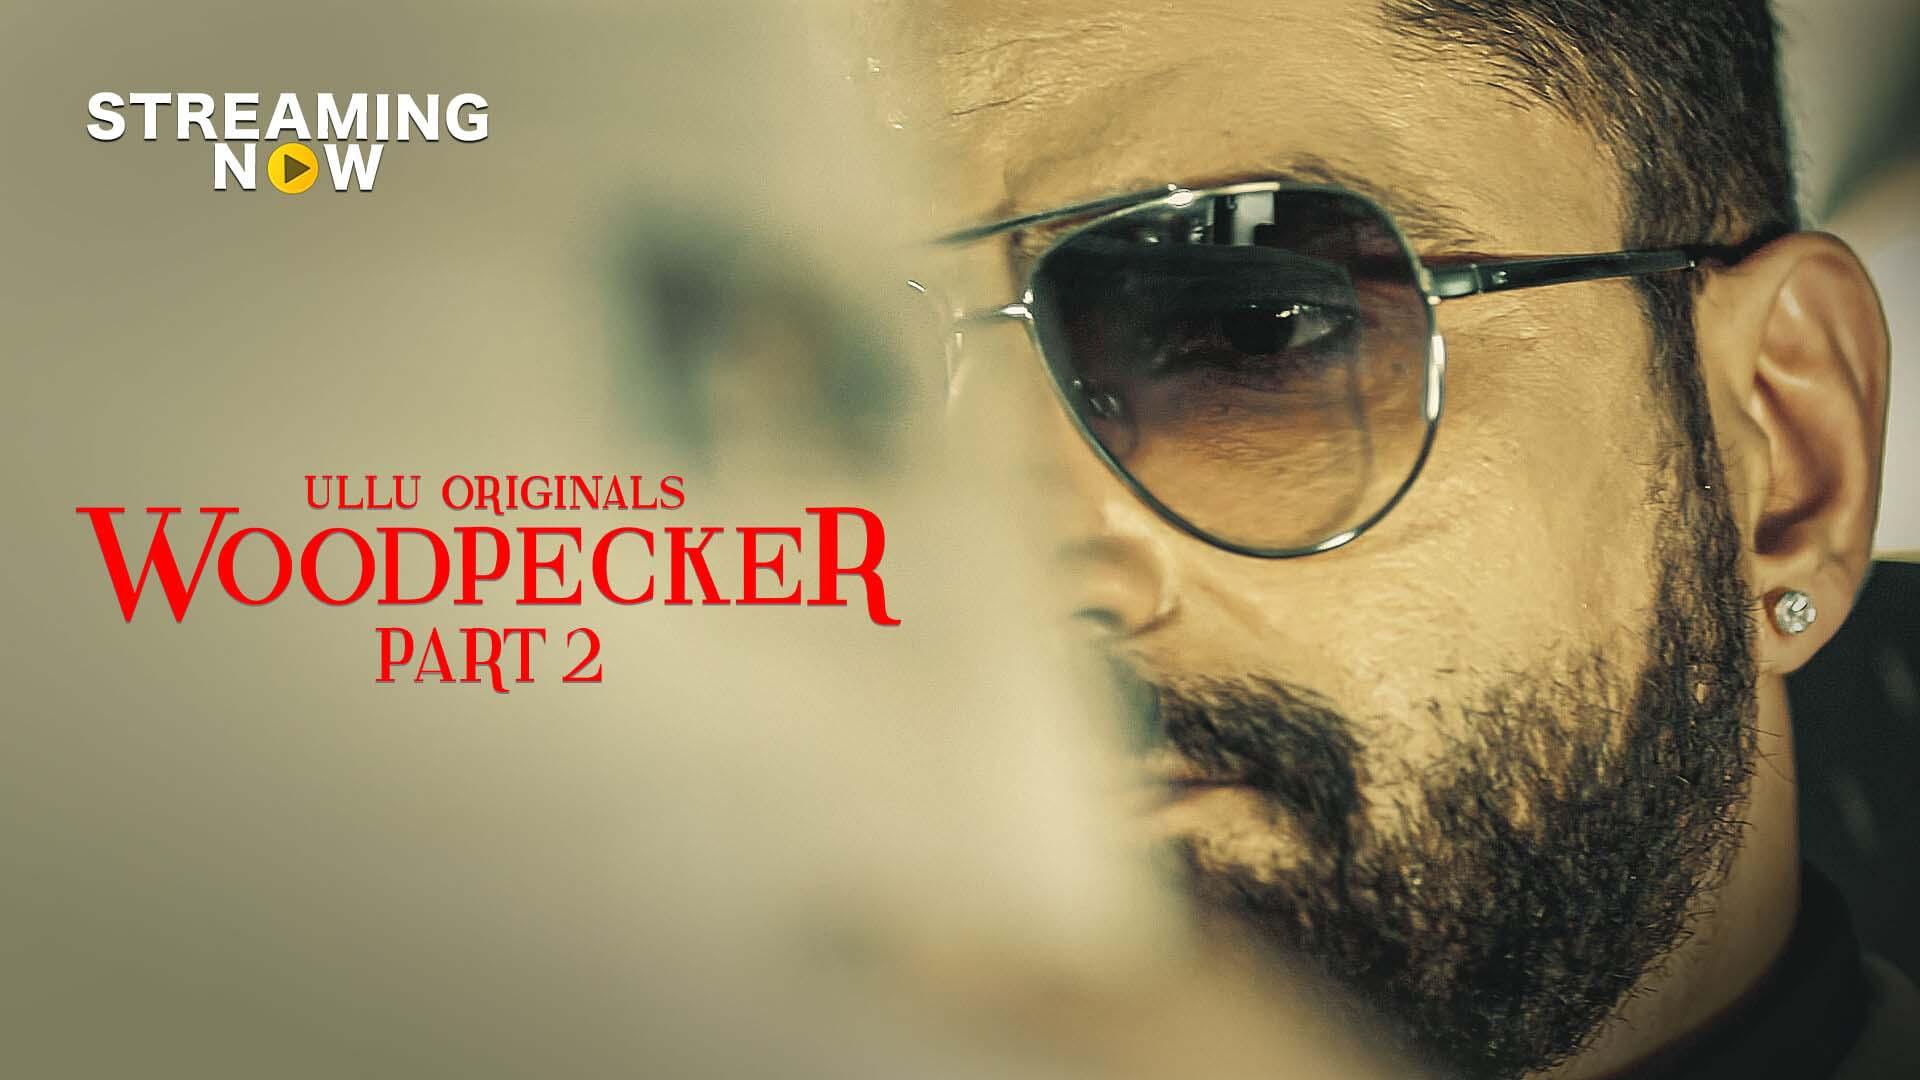 Woodpecker Part: 2 (2020) S01 Hindi Ullu Originals Complete Web Series 245MB HDRip Download